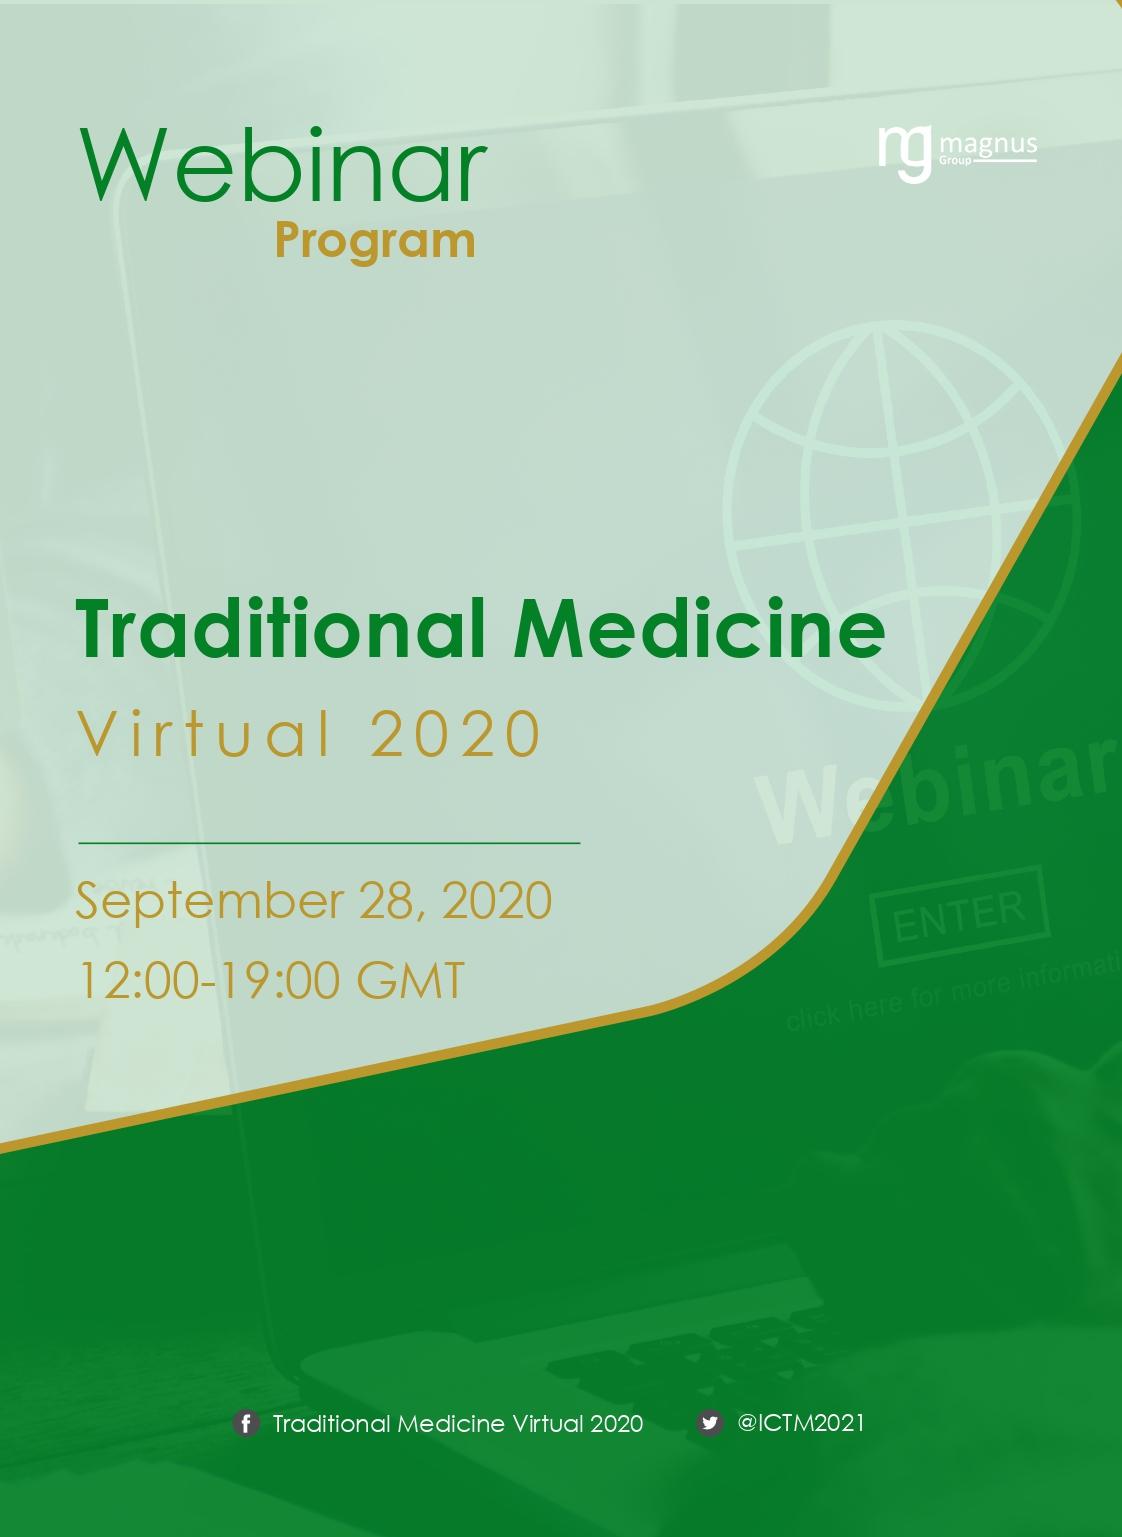 International Webinar on Traditional Medicine, Ethnomedicine and Natural Therapies   Online Event Program